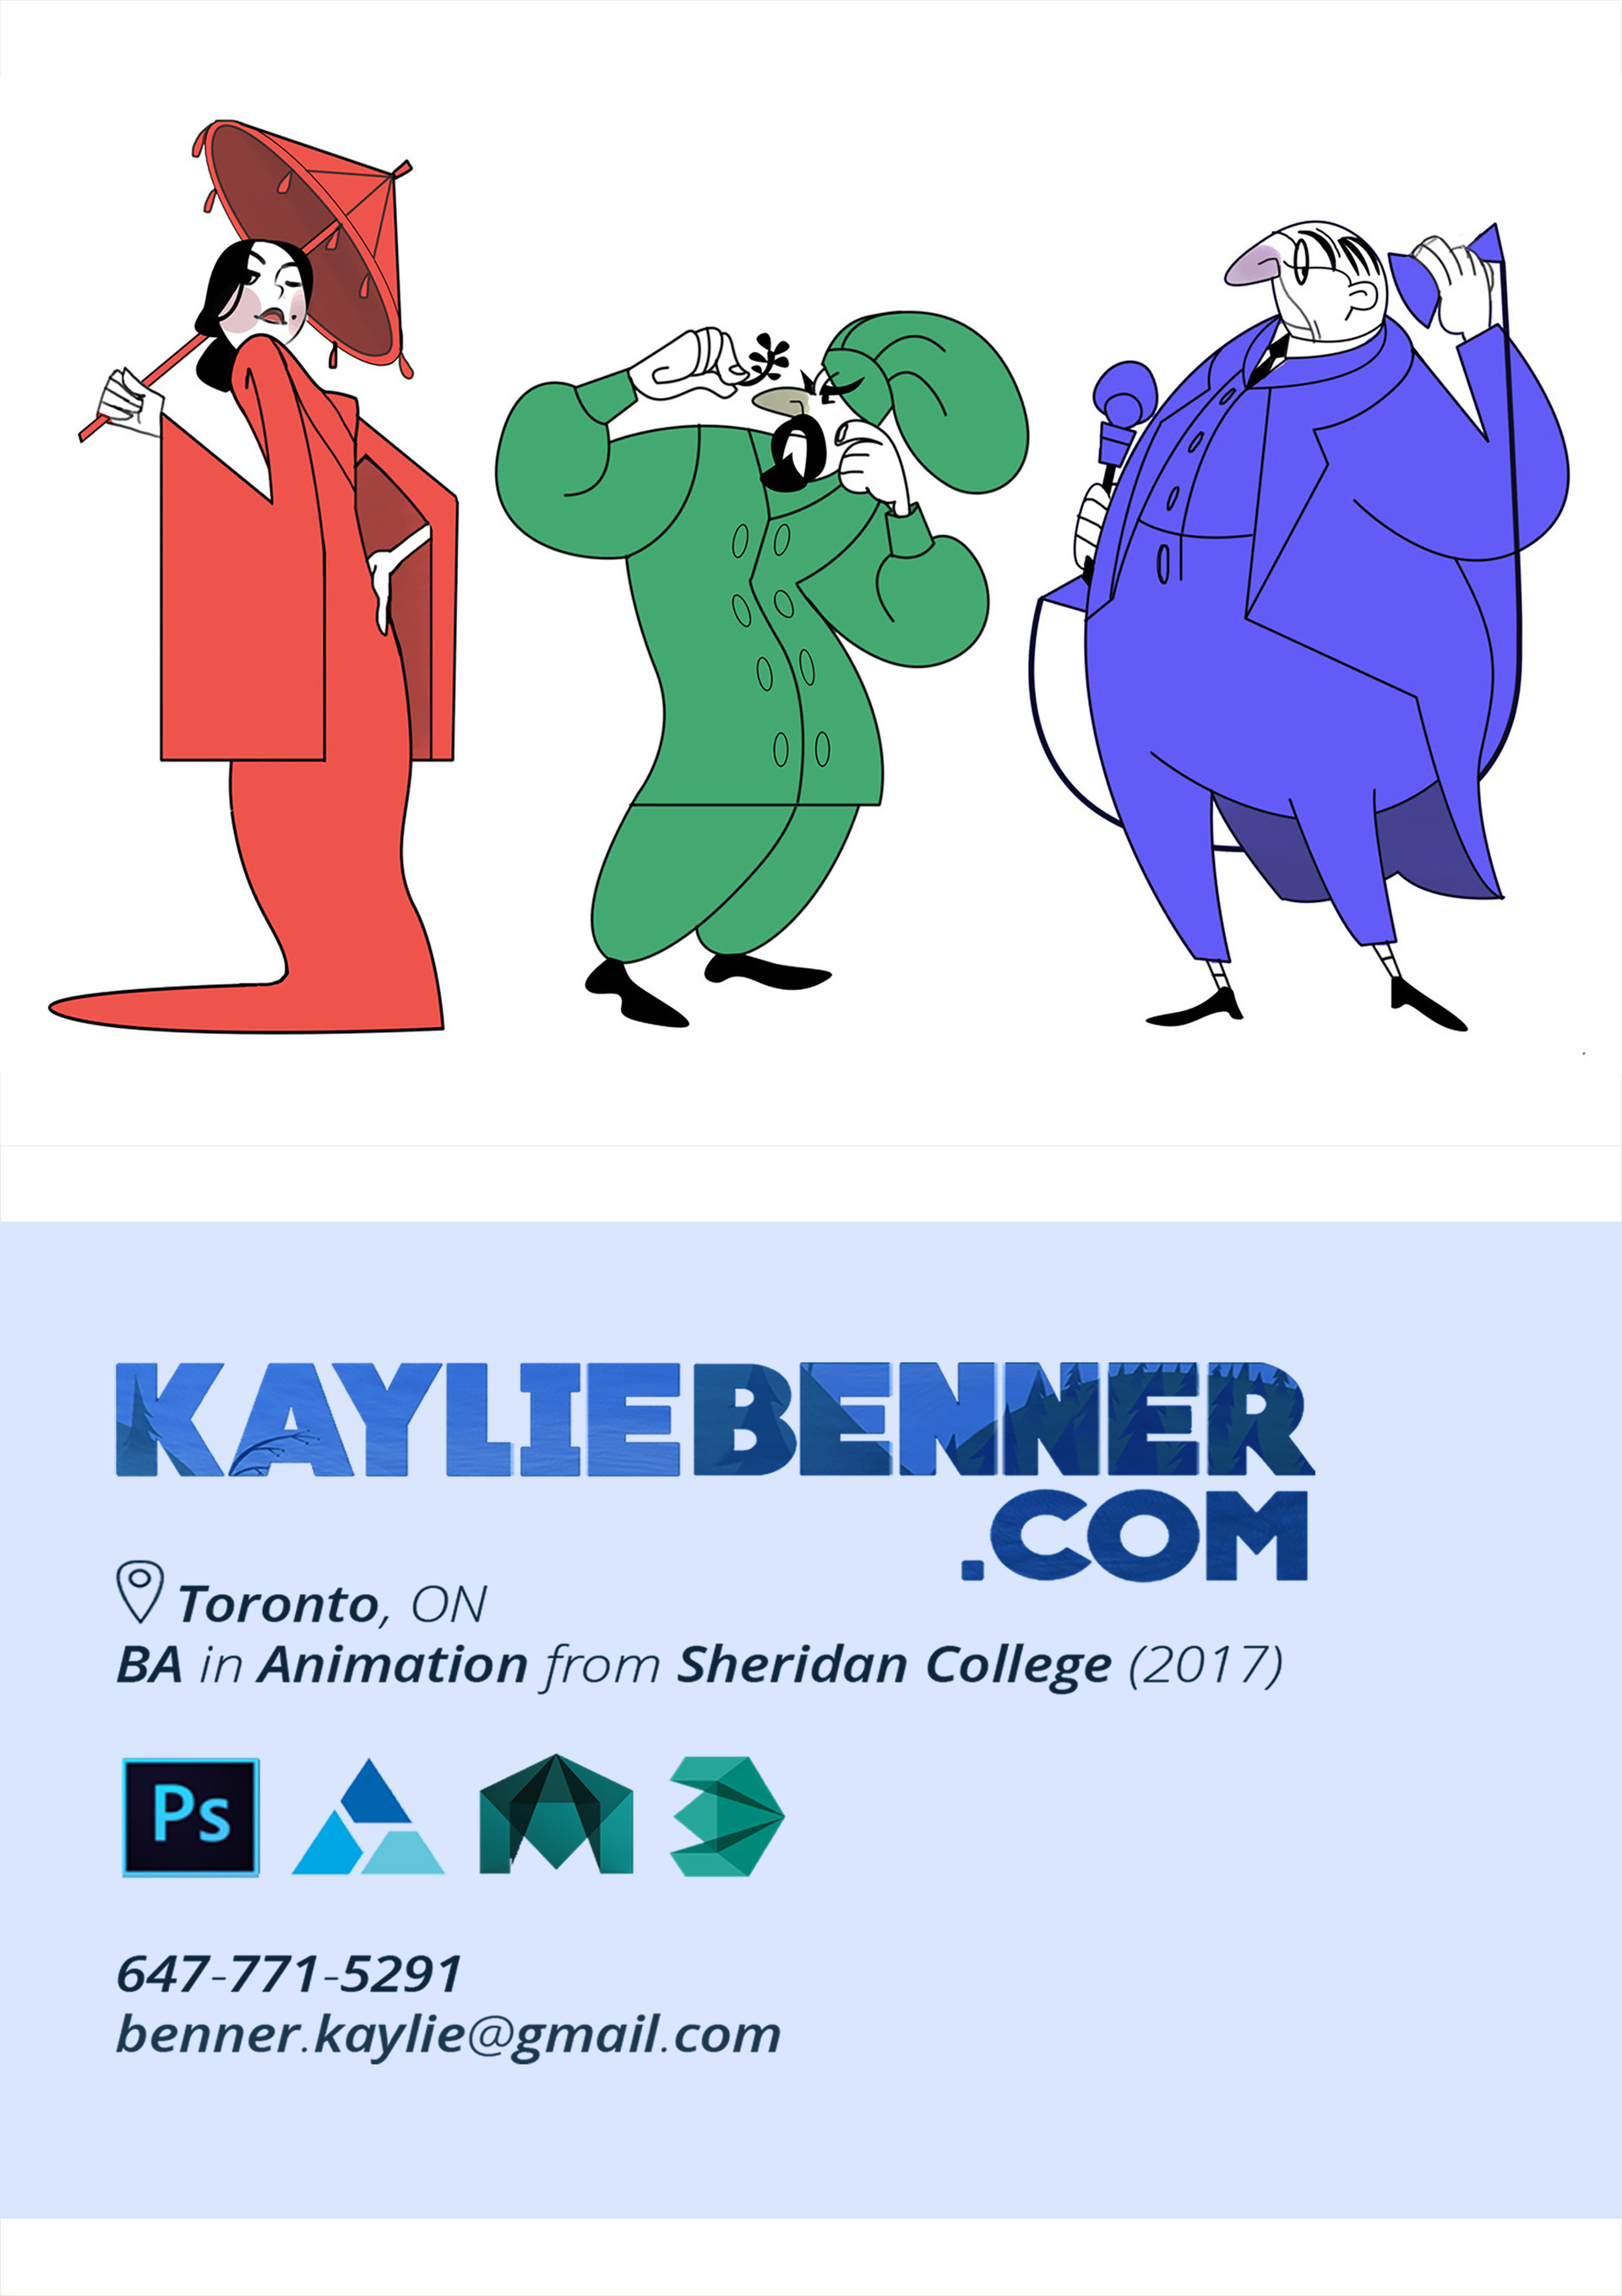 Kaylie benner postcard3